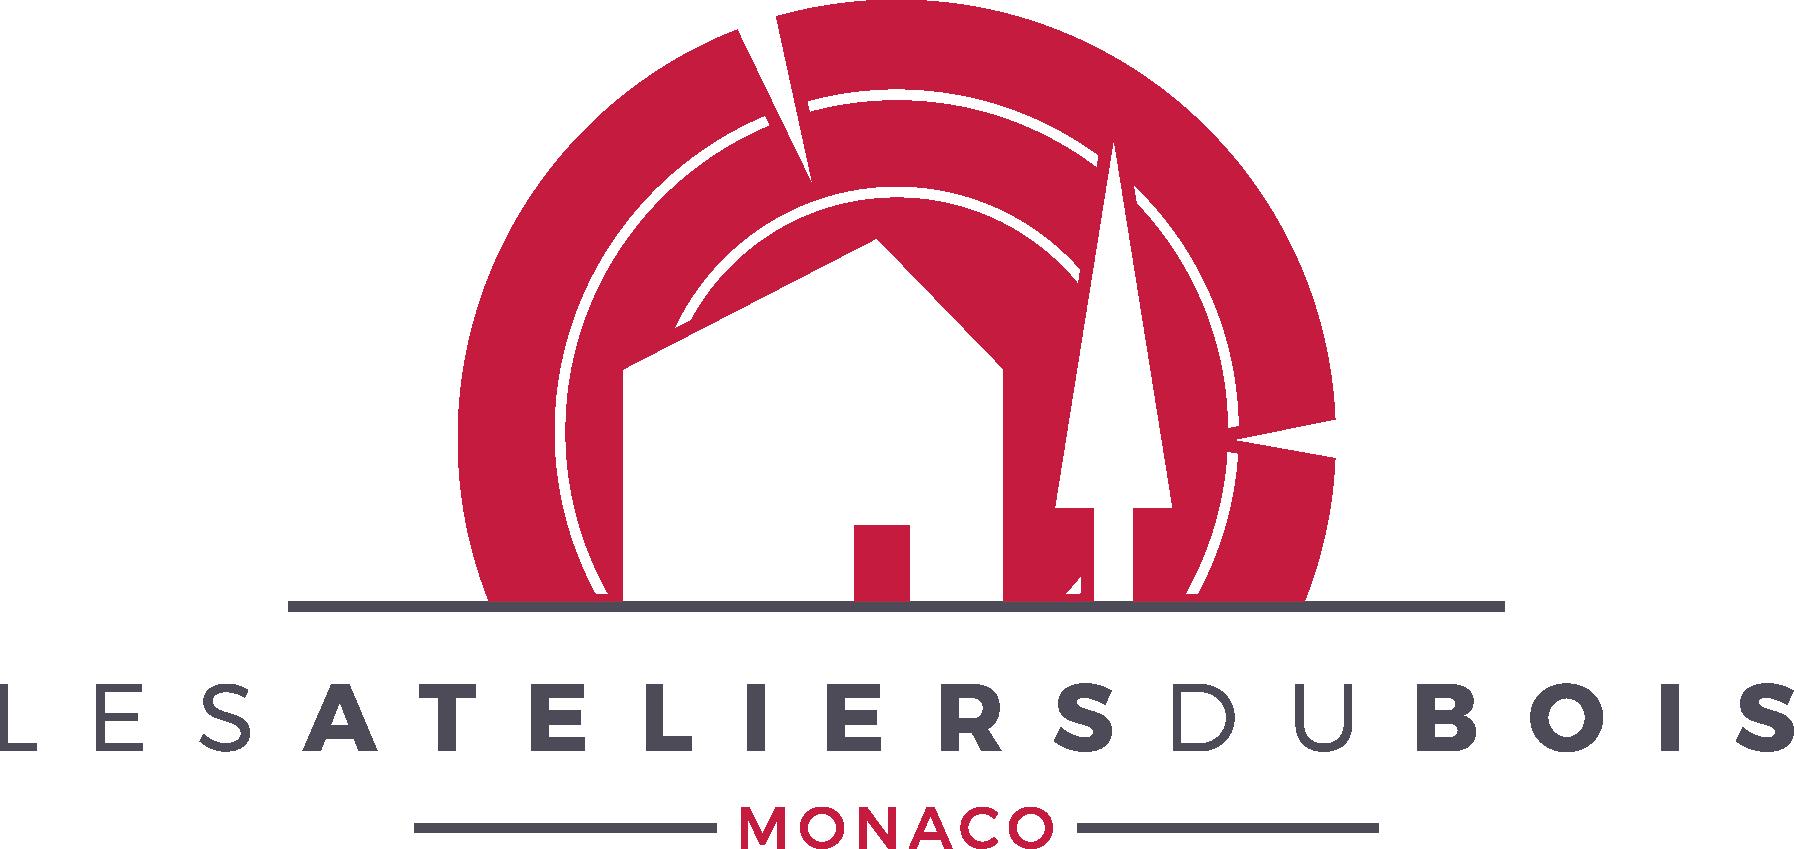 Atelier Du Bois Monaco ateliers du bois - jb pastor & fils - monacojb pastor & fils